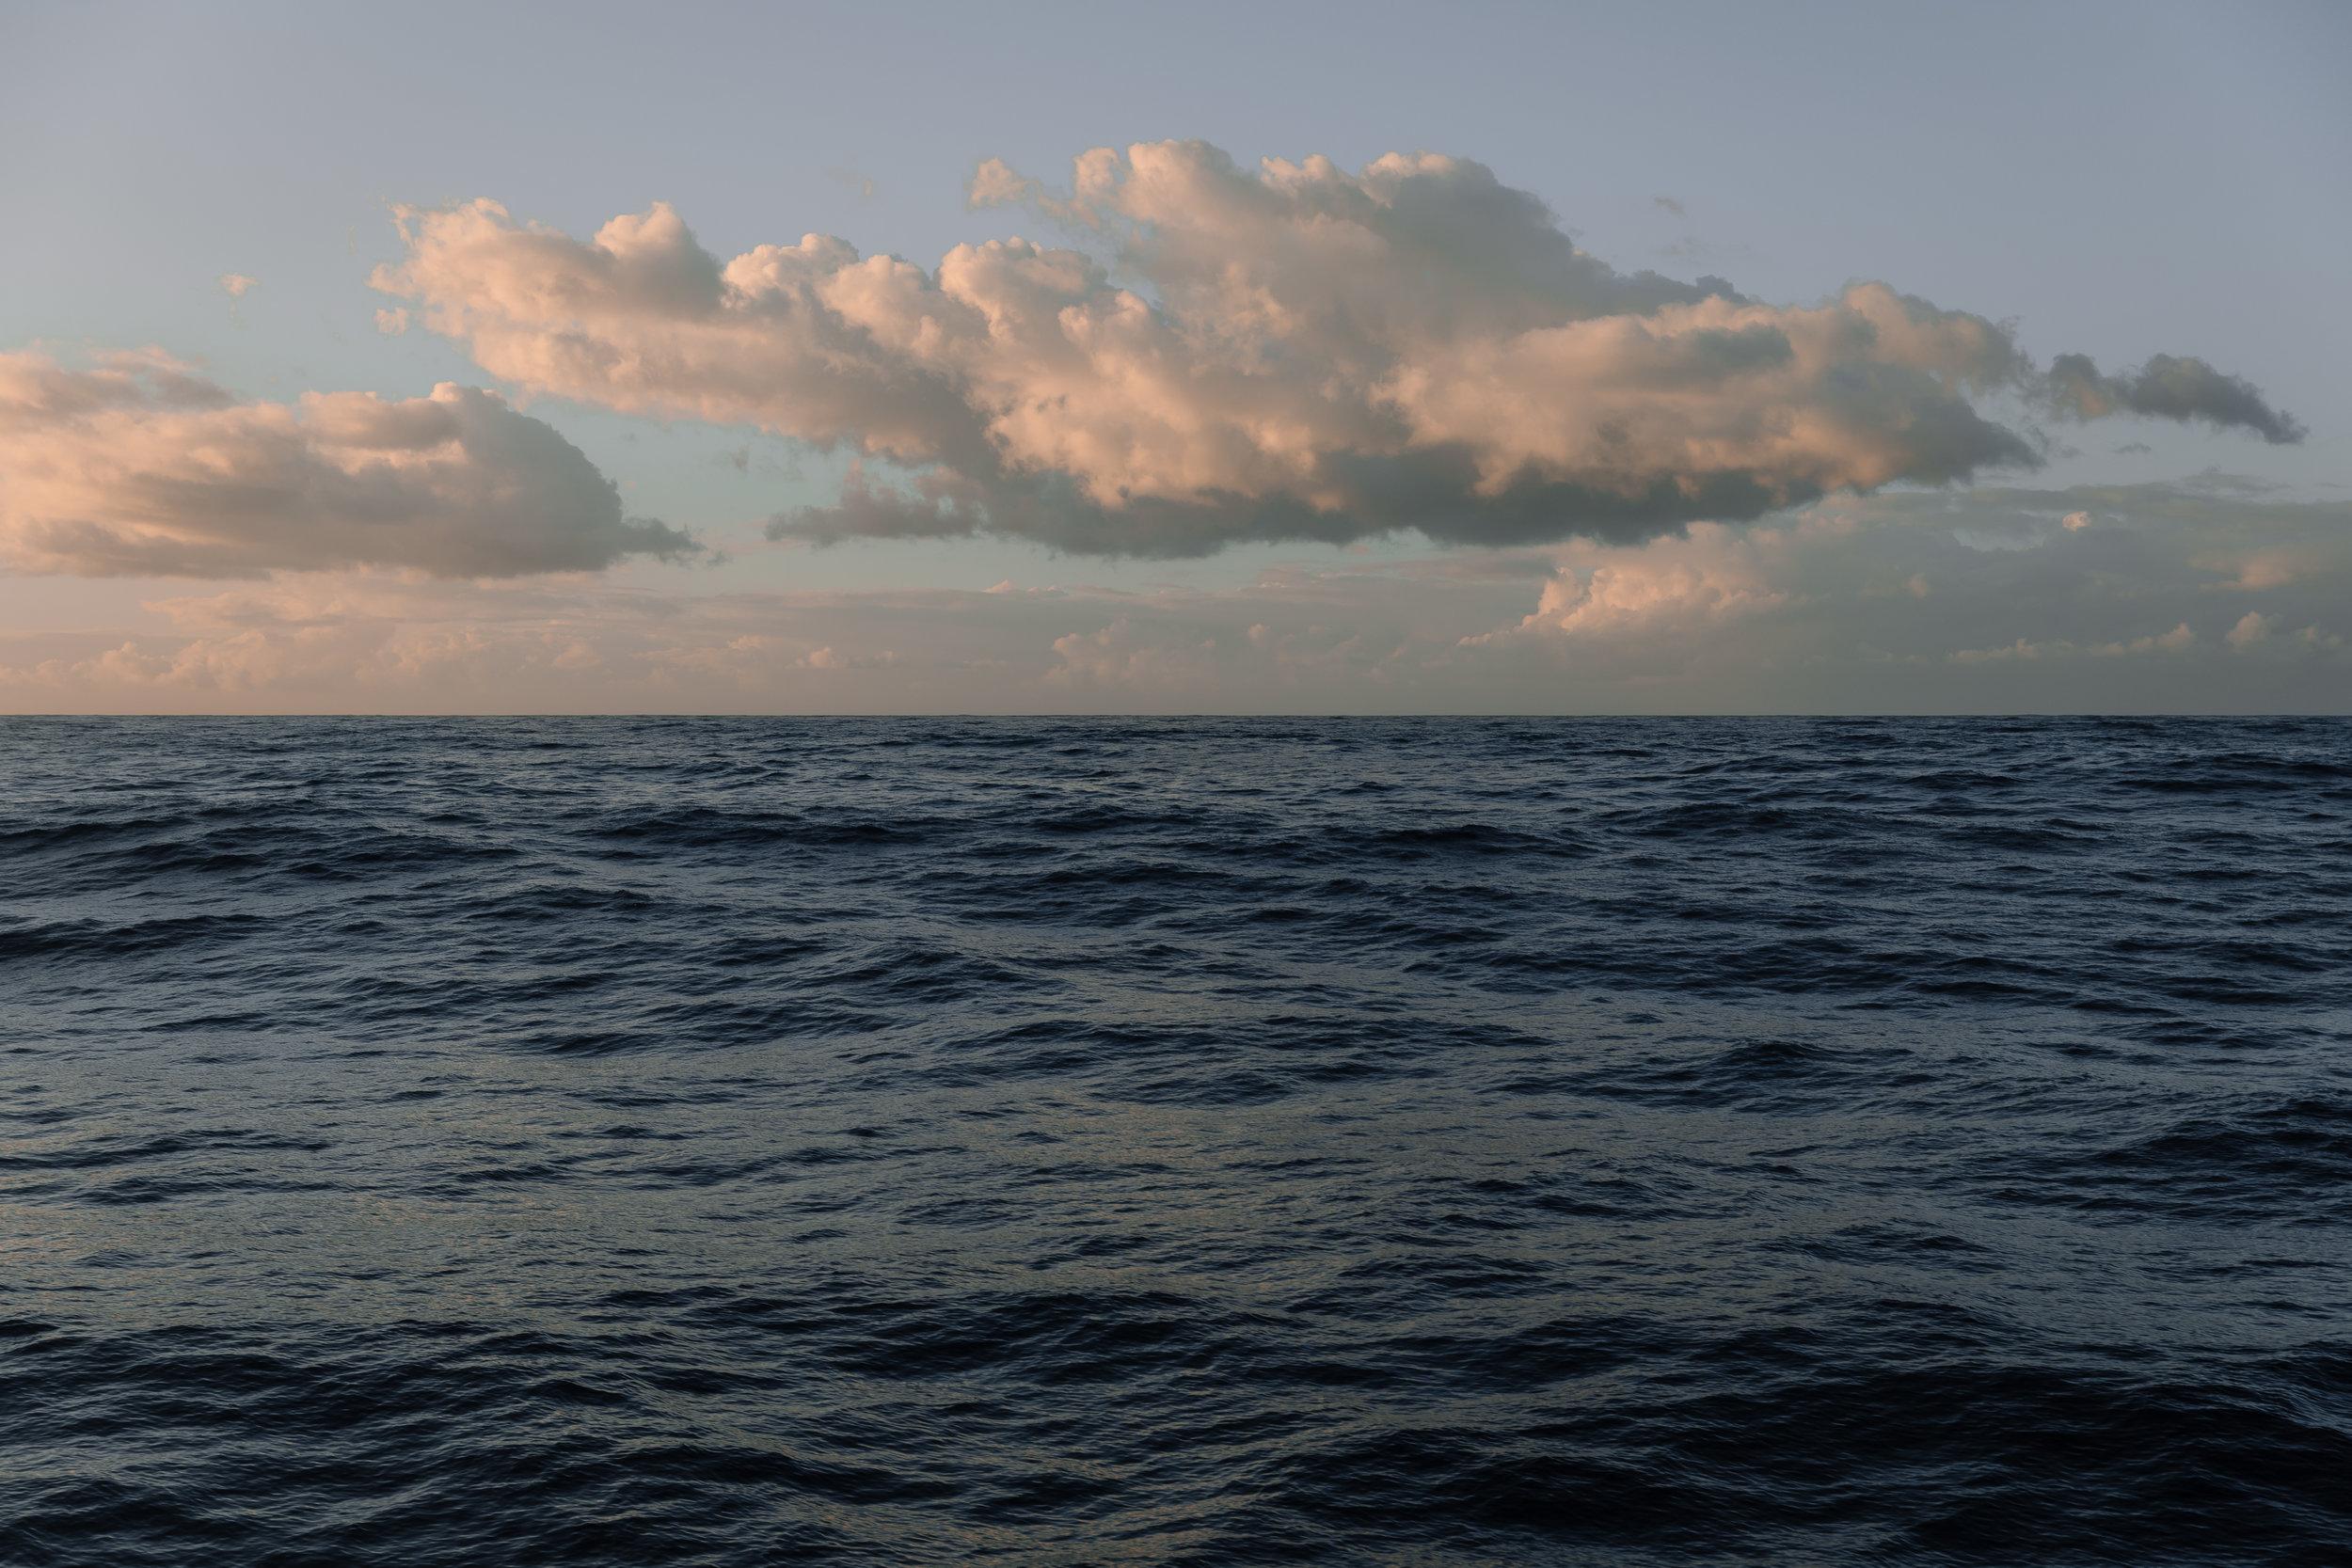 04_5DMarkIV, Boat, CreativeCloud, French, FrenchPolynesia, IntercontinentalBeach, JonathanBurkhart, Lightroom, Moorea, Ocean, PacificOcean, Paopao, Pape'ete, photography, Photoshop, Rotui, Tahiti.jpg